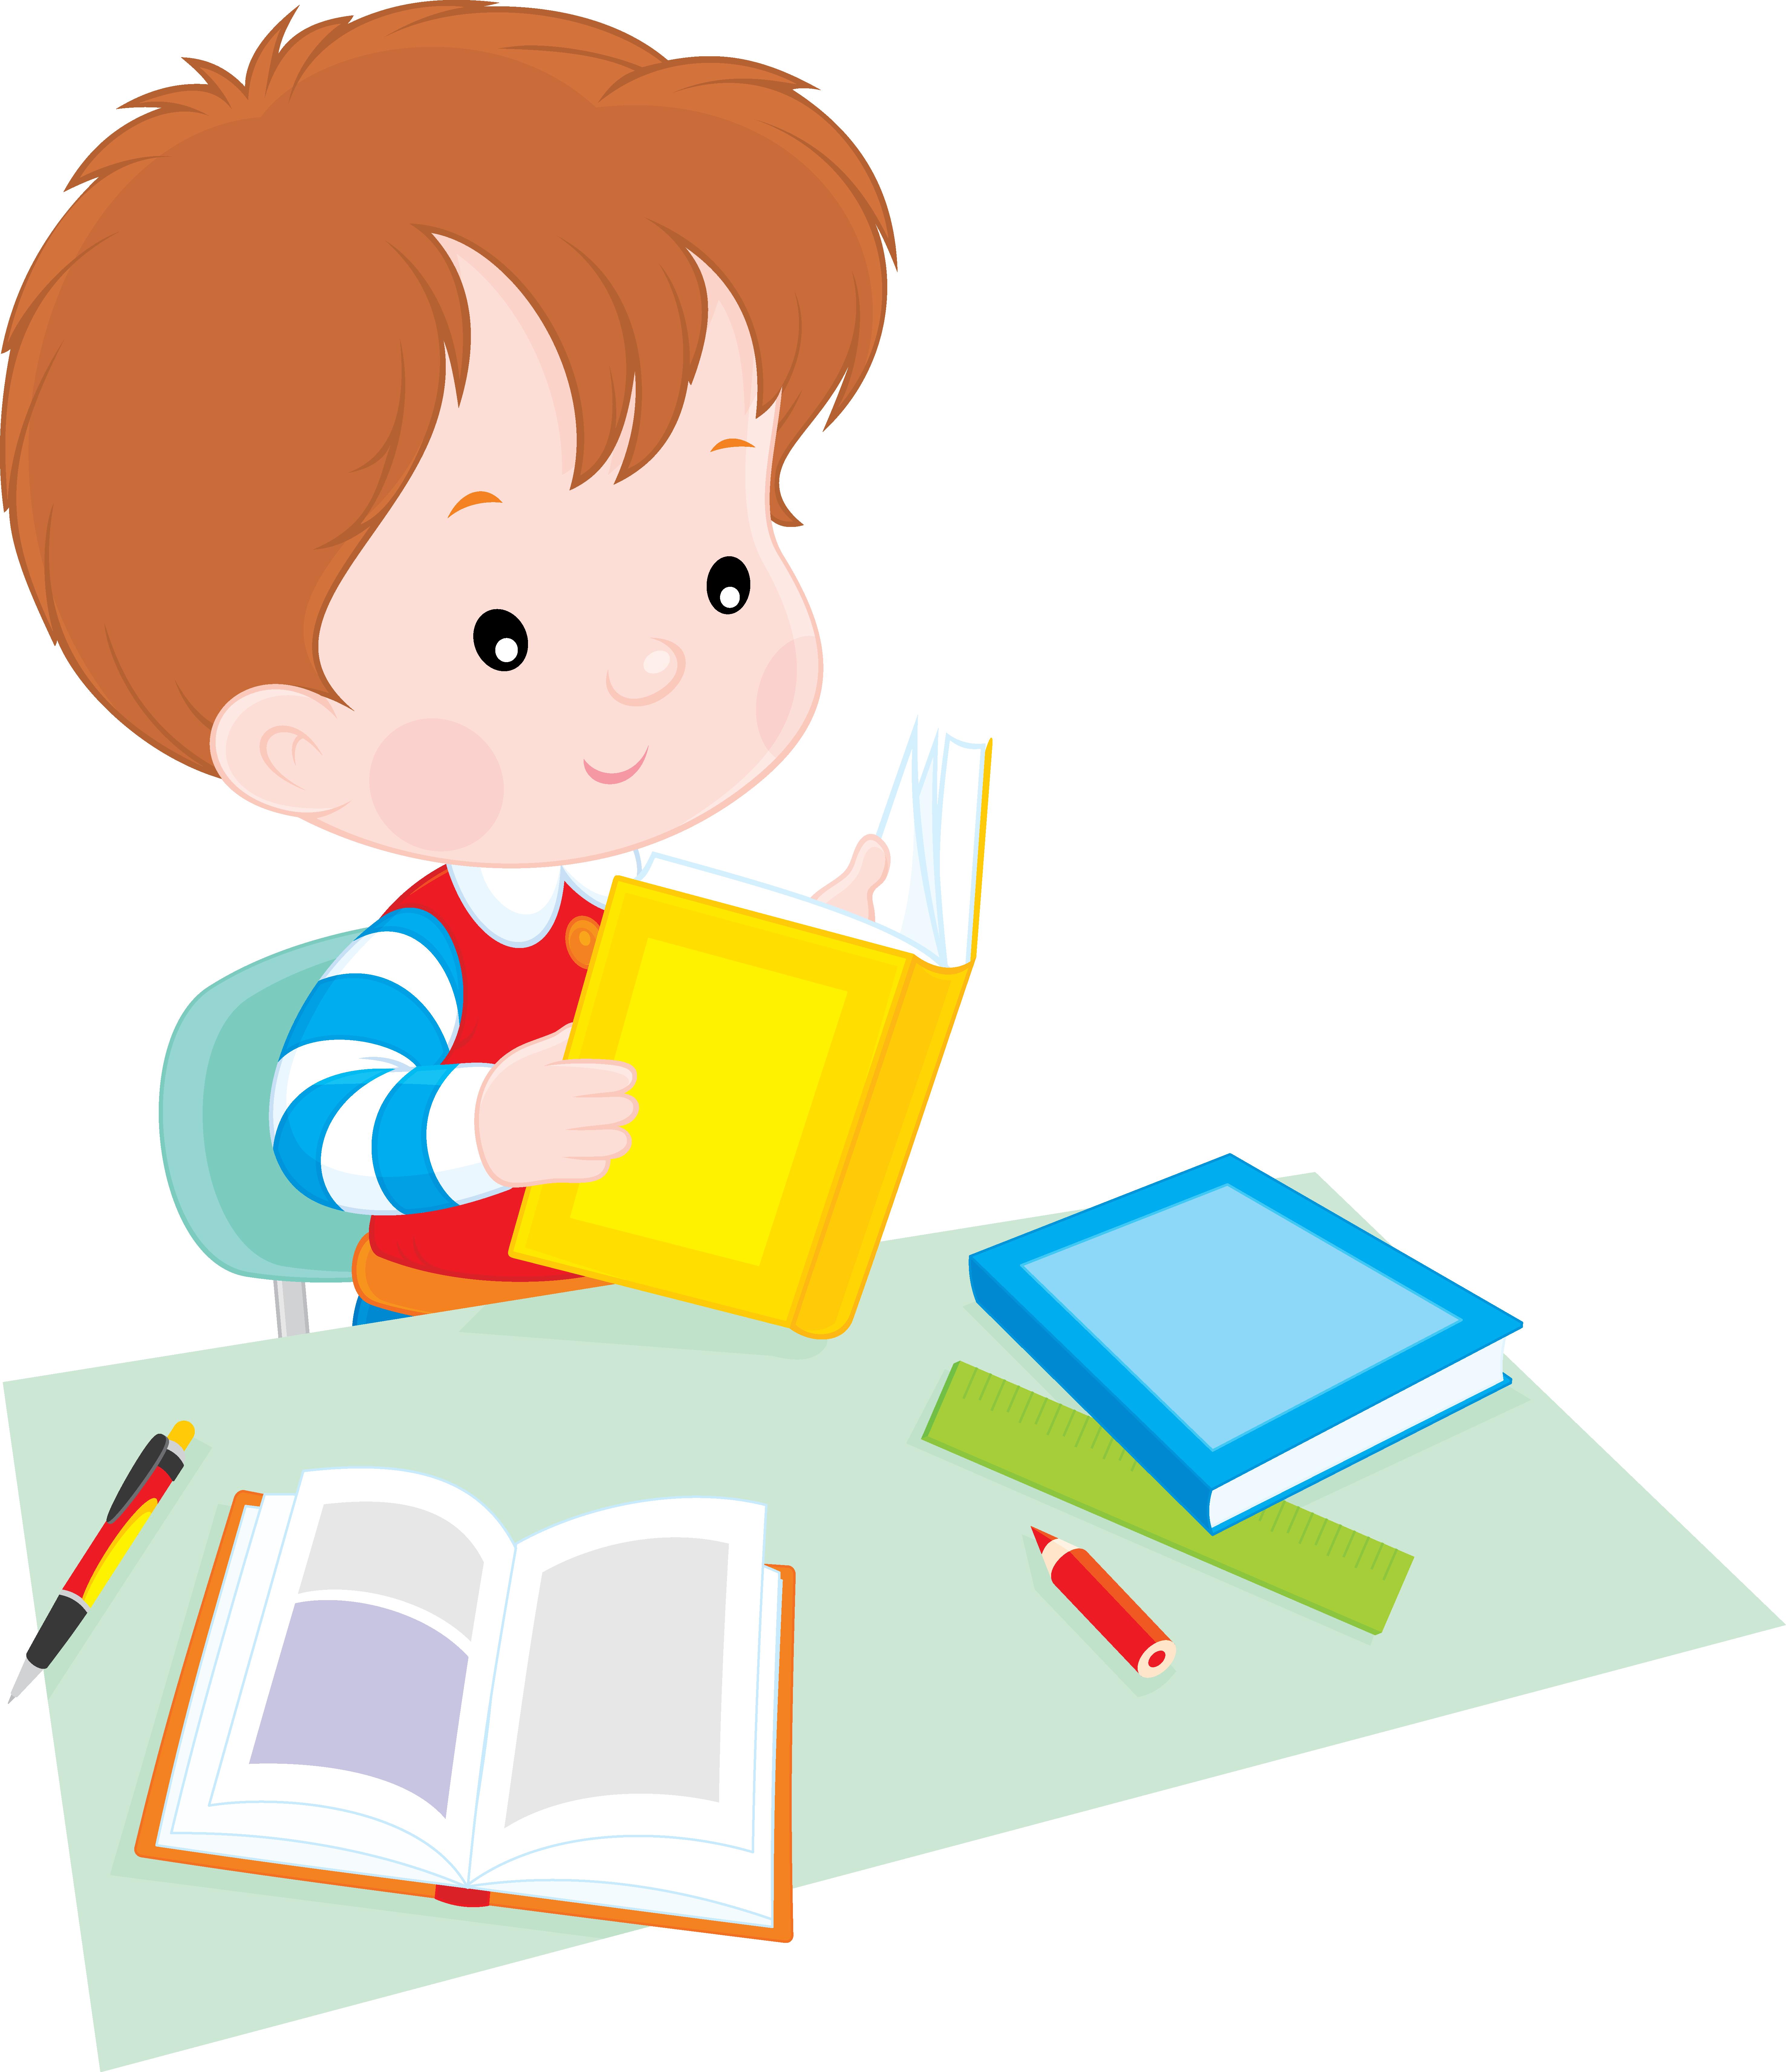 Children working at school clipart clip art transparent download Student Reading Clip art - School children 5906*6850 transprent Png ... clip art transparent download